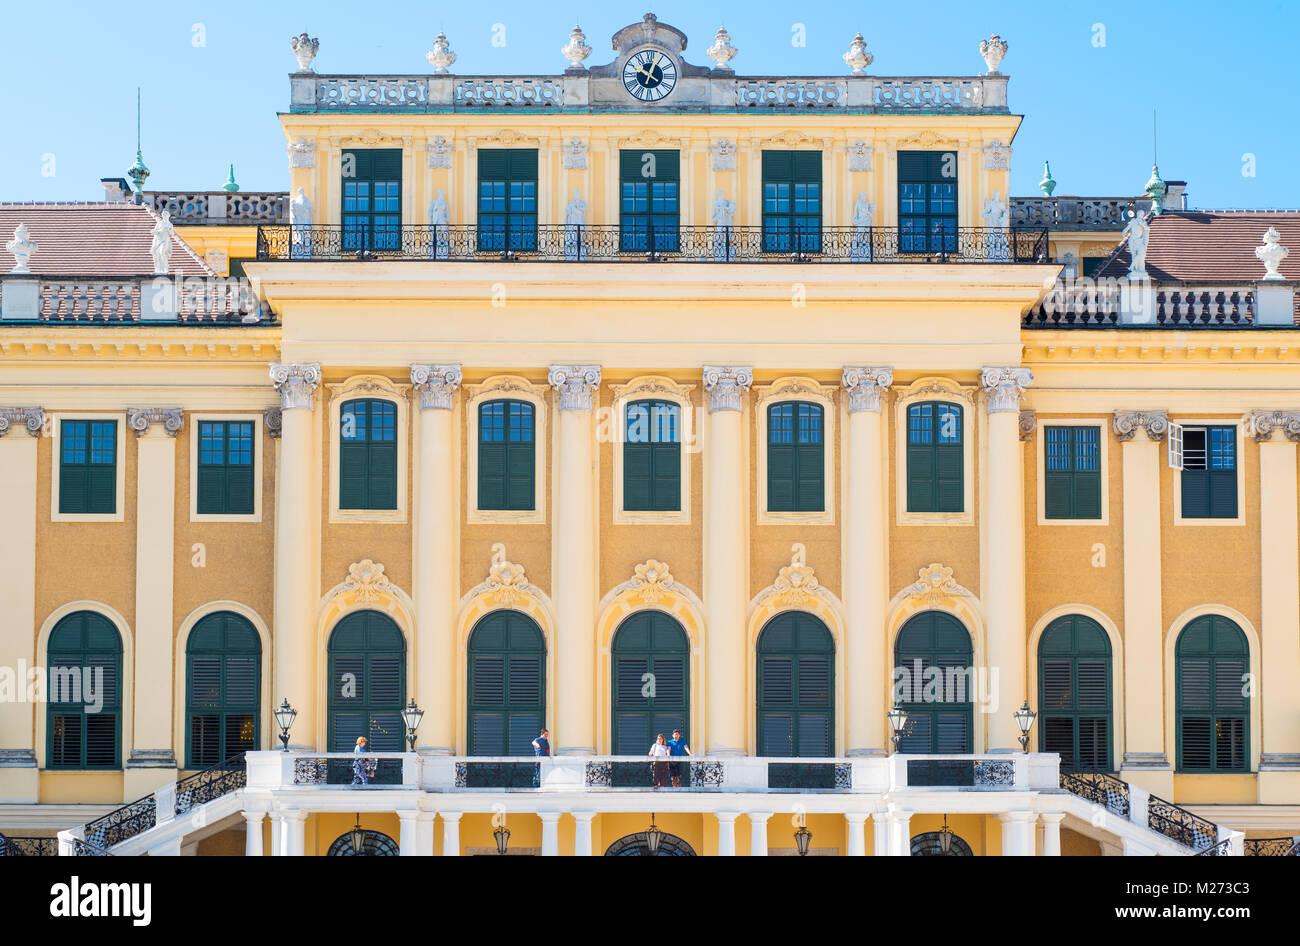 Austria, Vienna,  The main facade of the Schonbrunn Palace - Stock Image